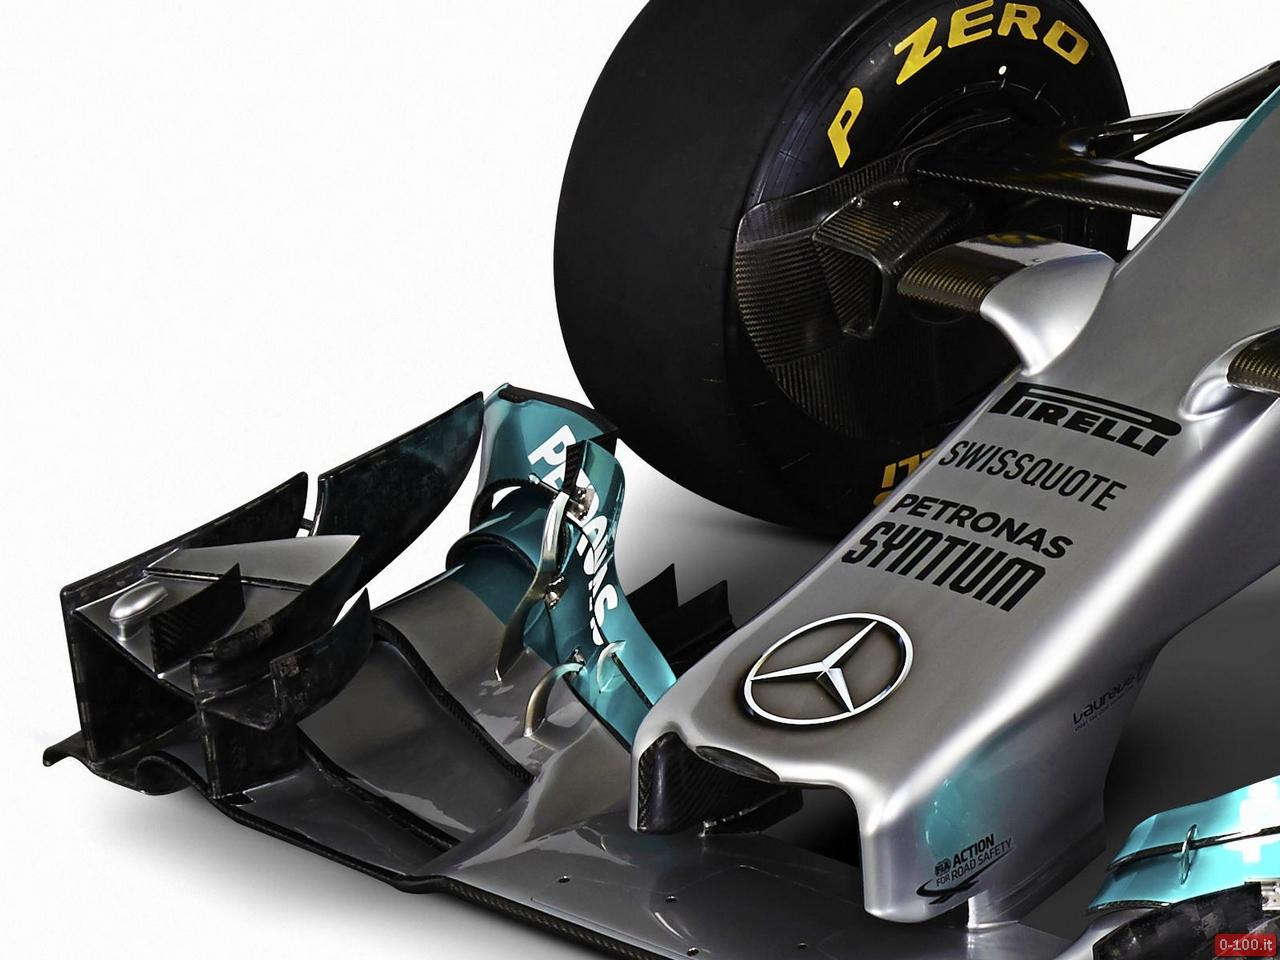 mercedes-amg-petronas-F1-W05-2014-Rosberg-Hamilton-0-100_9